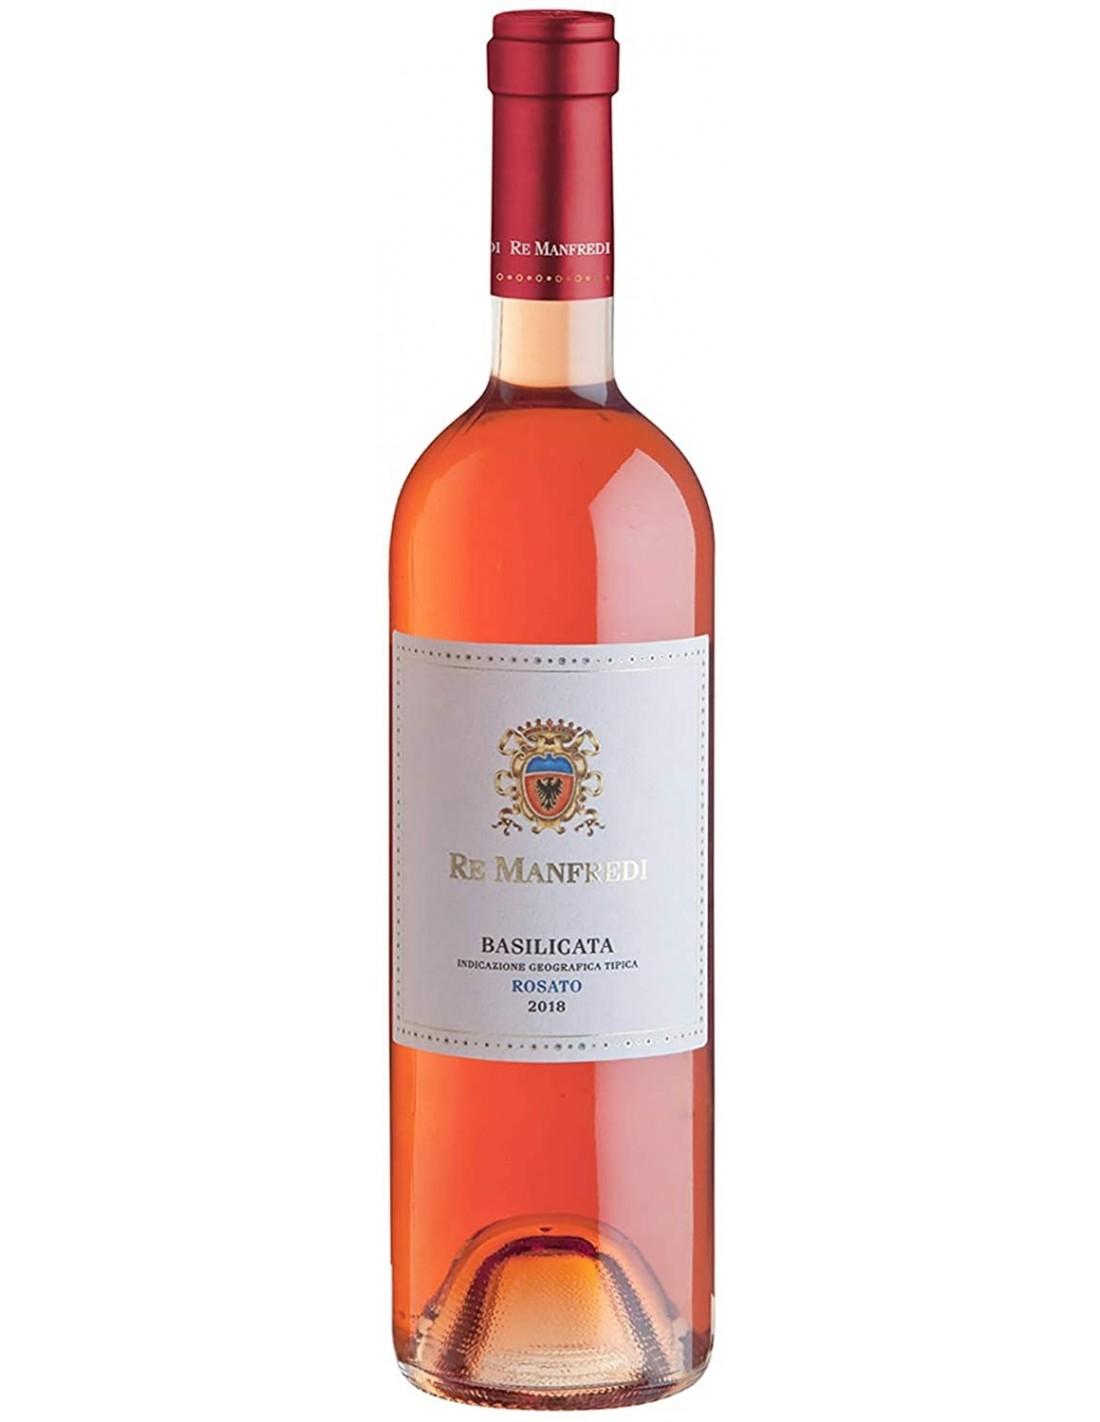 Vin roze Re Manfredi Rosato Basilicata, 12.5% alc., 0.75 L, Italia